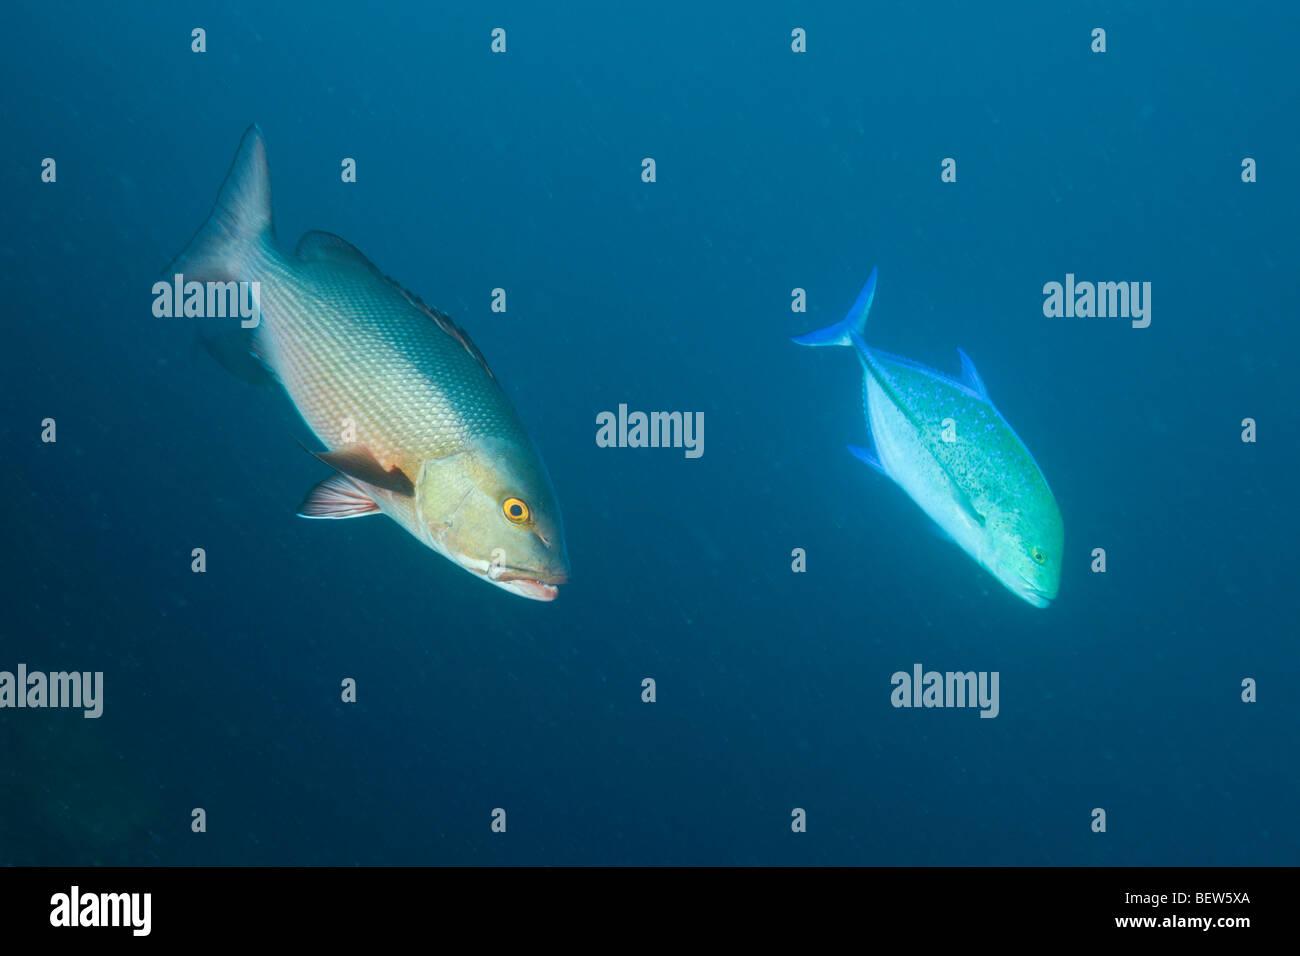 Red Reef Snapper and Bluefin Trevally, Lutjanus bohar, Caranx melampygus, Himendhoo Thila, North Ari Atoll, Maldives Stock Photo